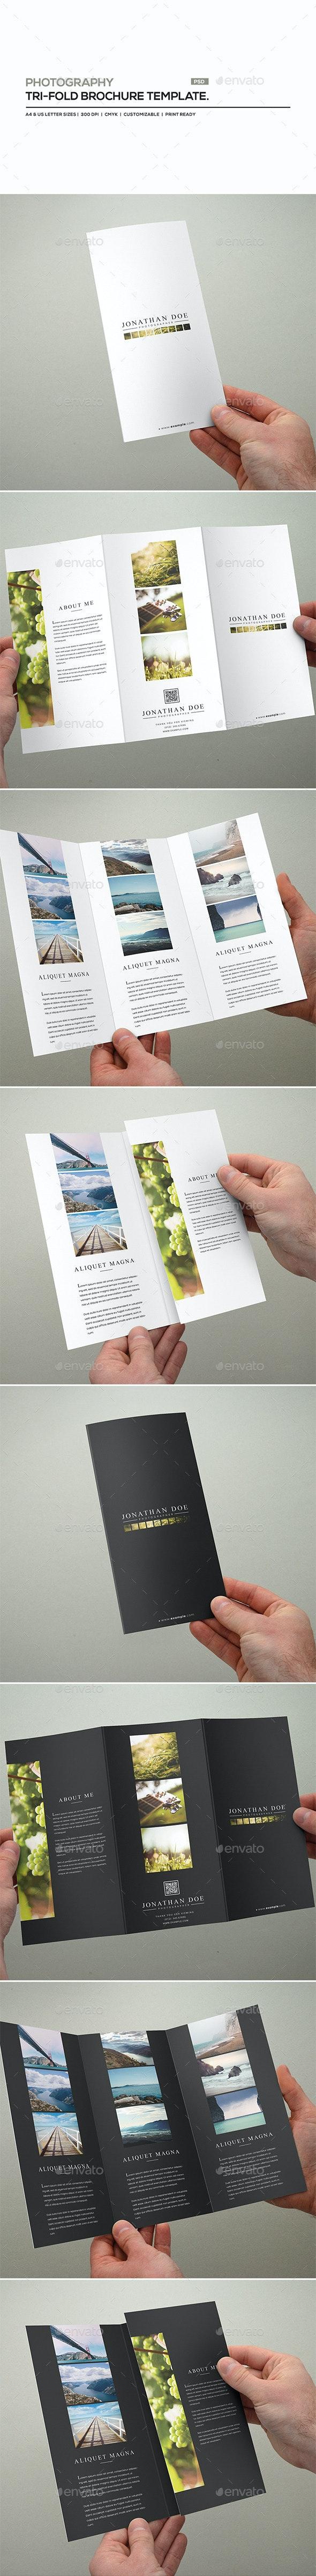 Photography Tri-Fold Brochure Template - Portfolio Brochures